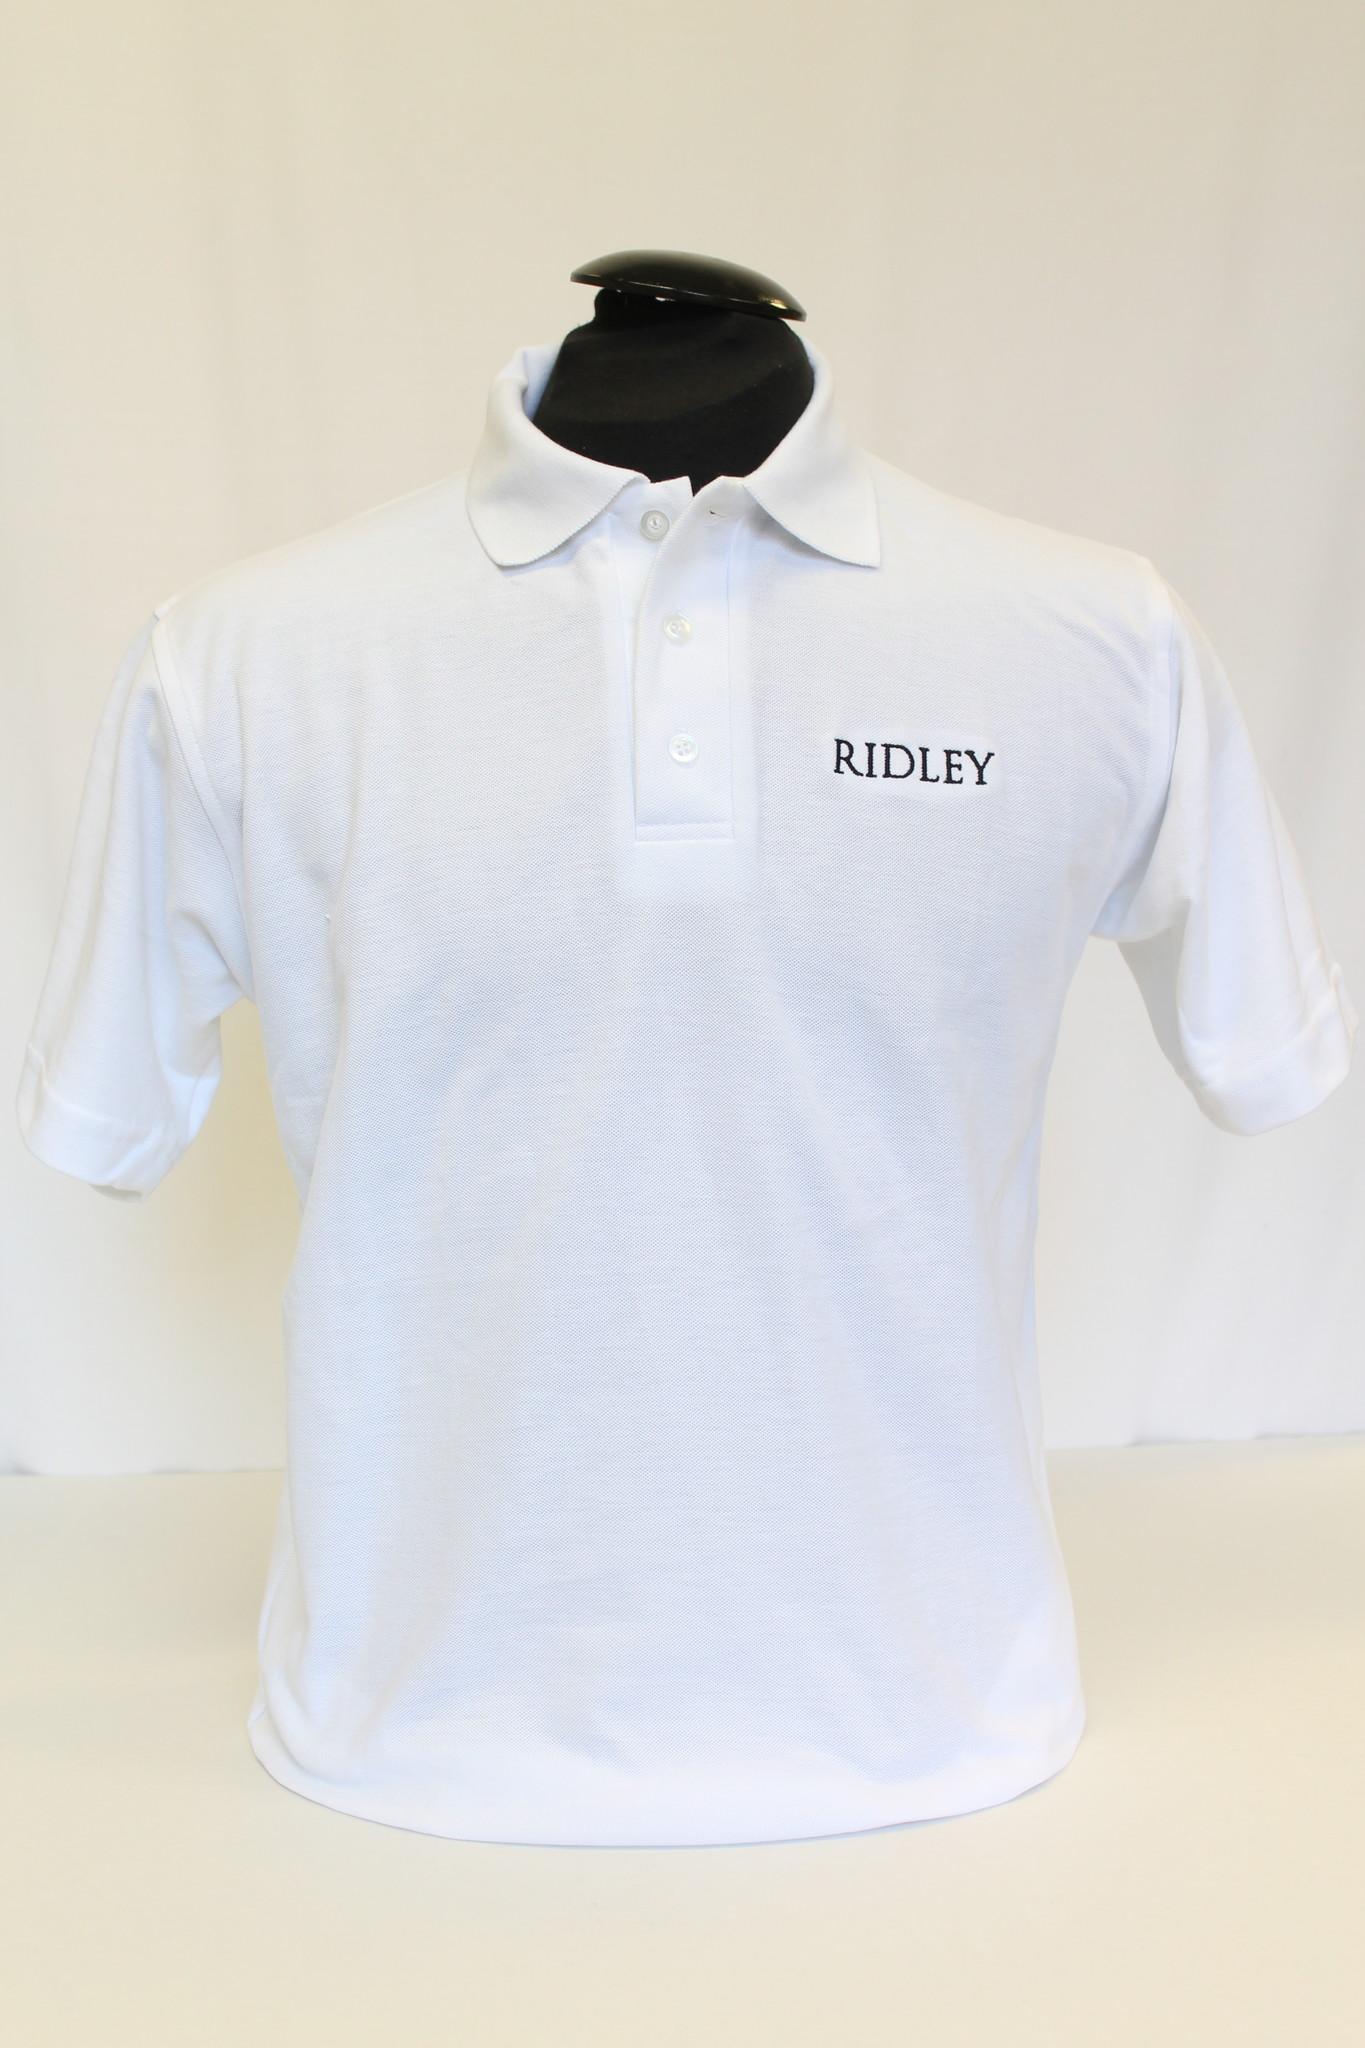 Classroom Dress - 2021 White Polo Shirt (Youth)